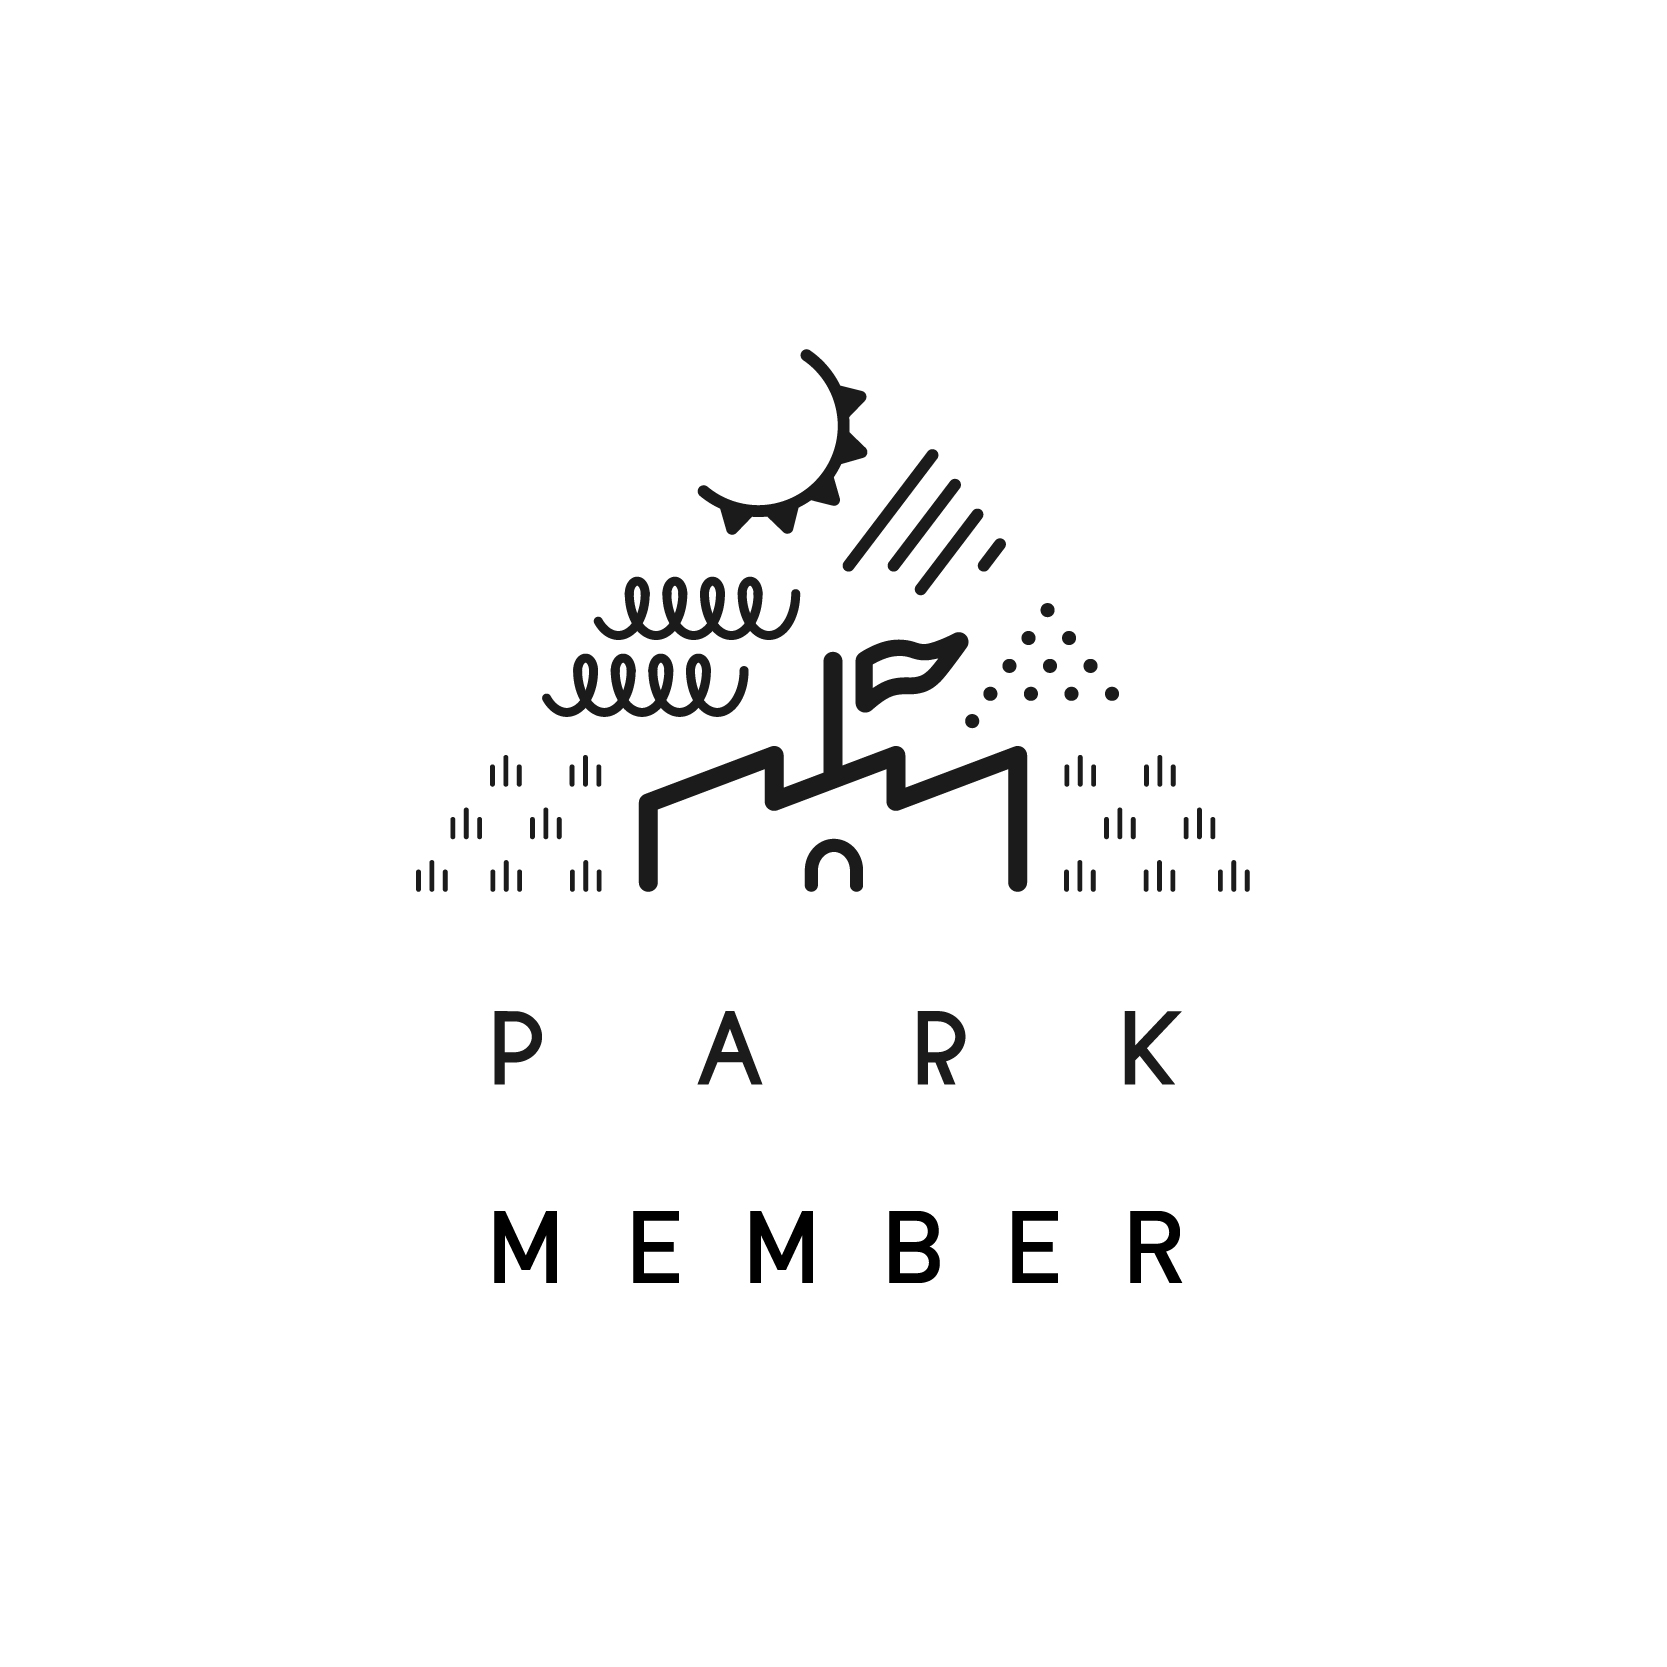 PARK会員募集中!!